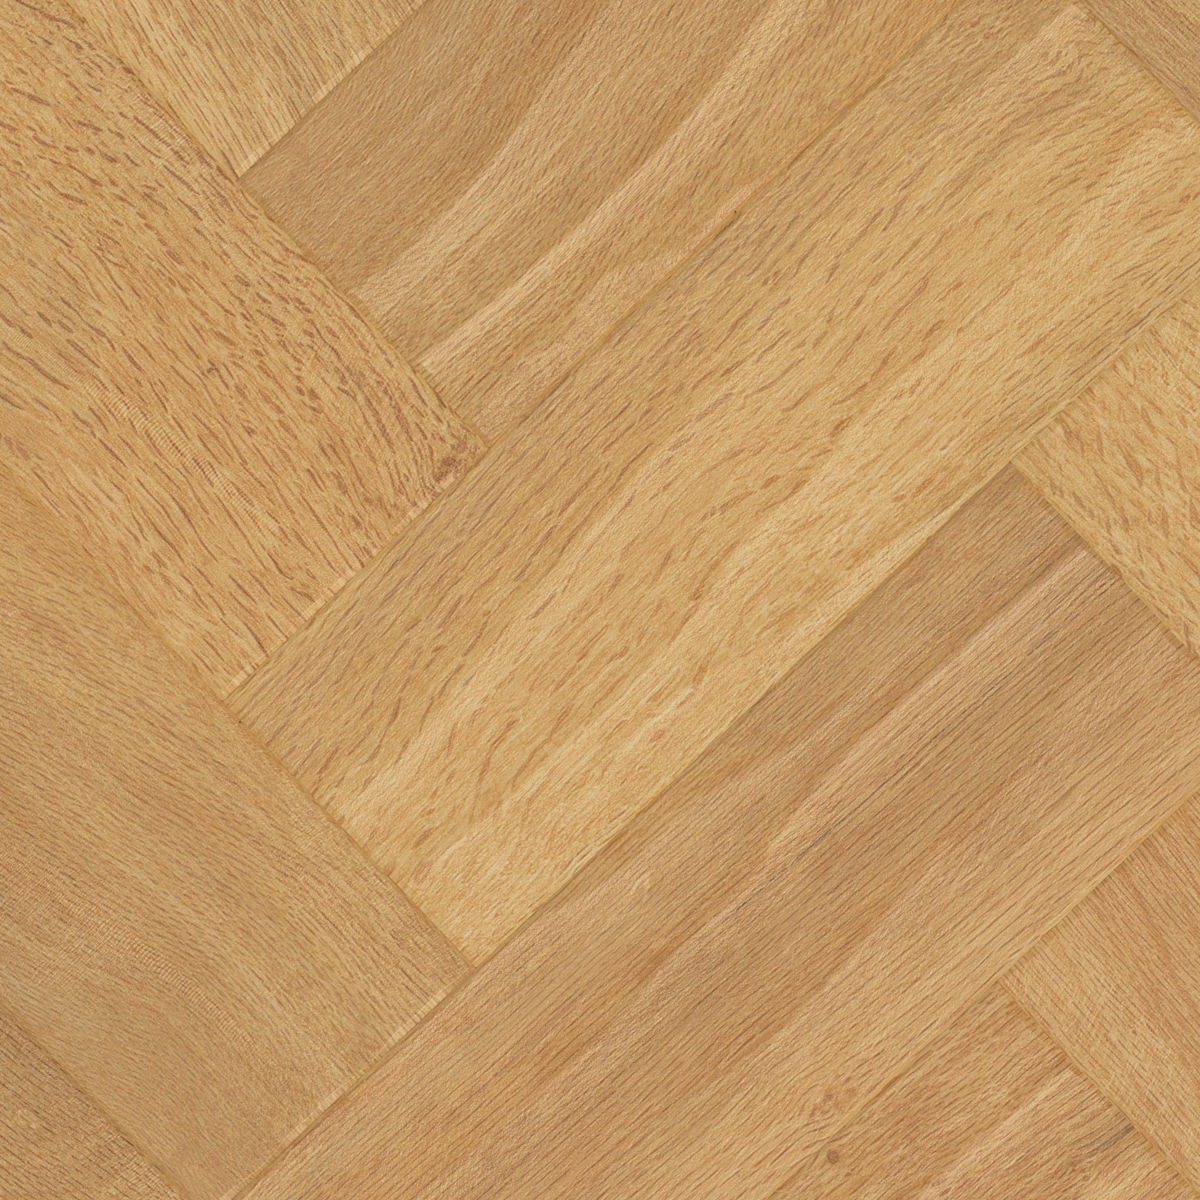 karndean art select blond oak parquet ap01 vinyl flooring. Black Bedroom Furniture Sets. Home Design Ideas